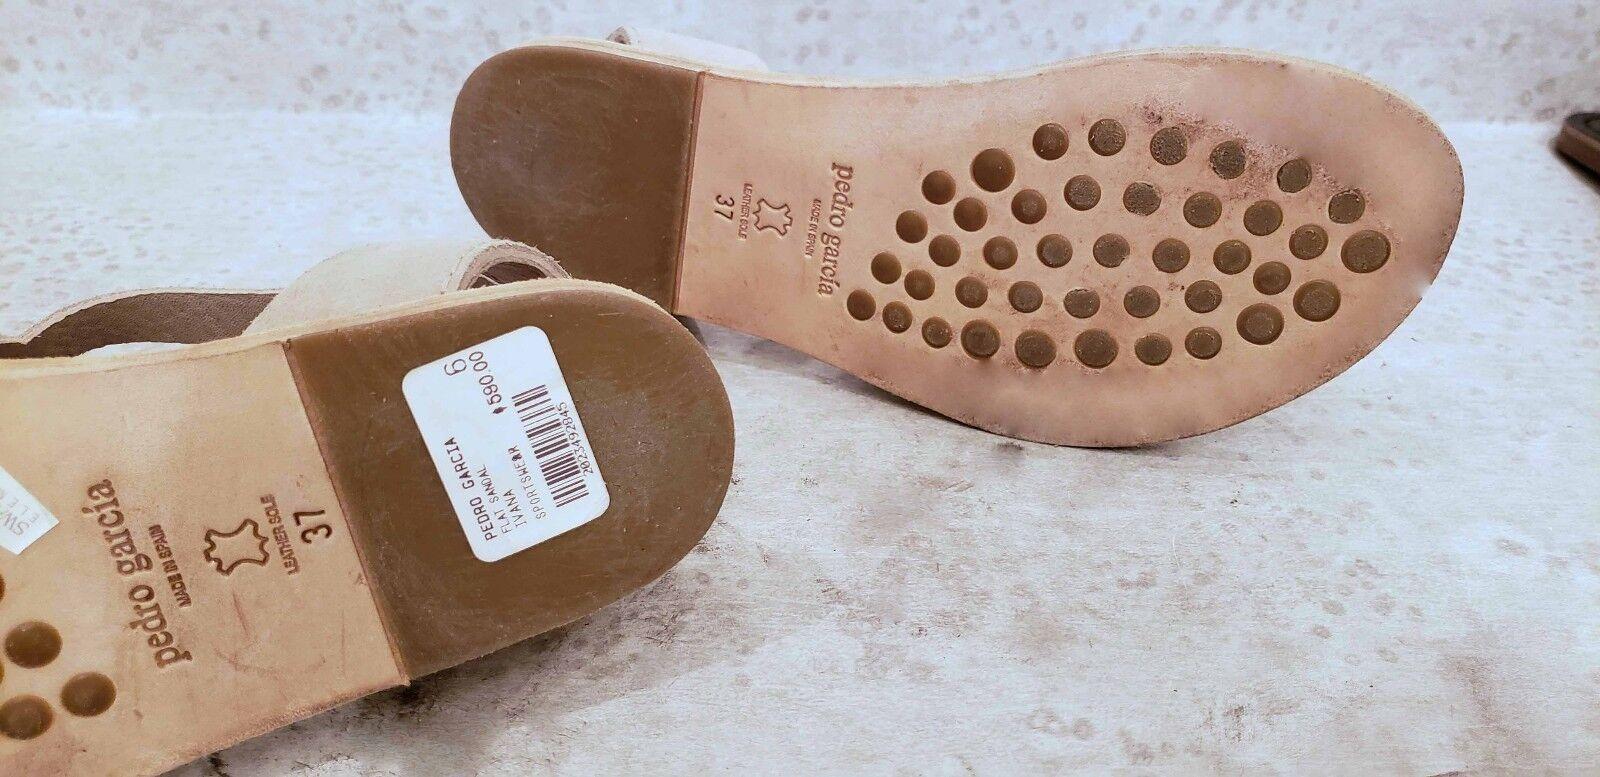 Pedro Garcia Ivana crystal sandals  size size size 37 us size 6.5  590 22a2d5